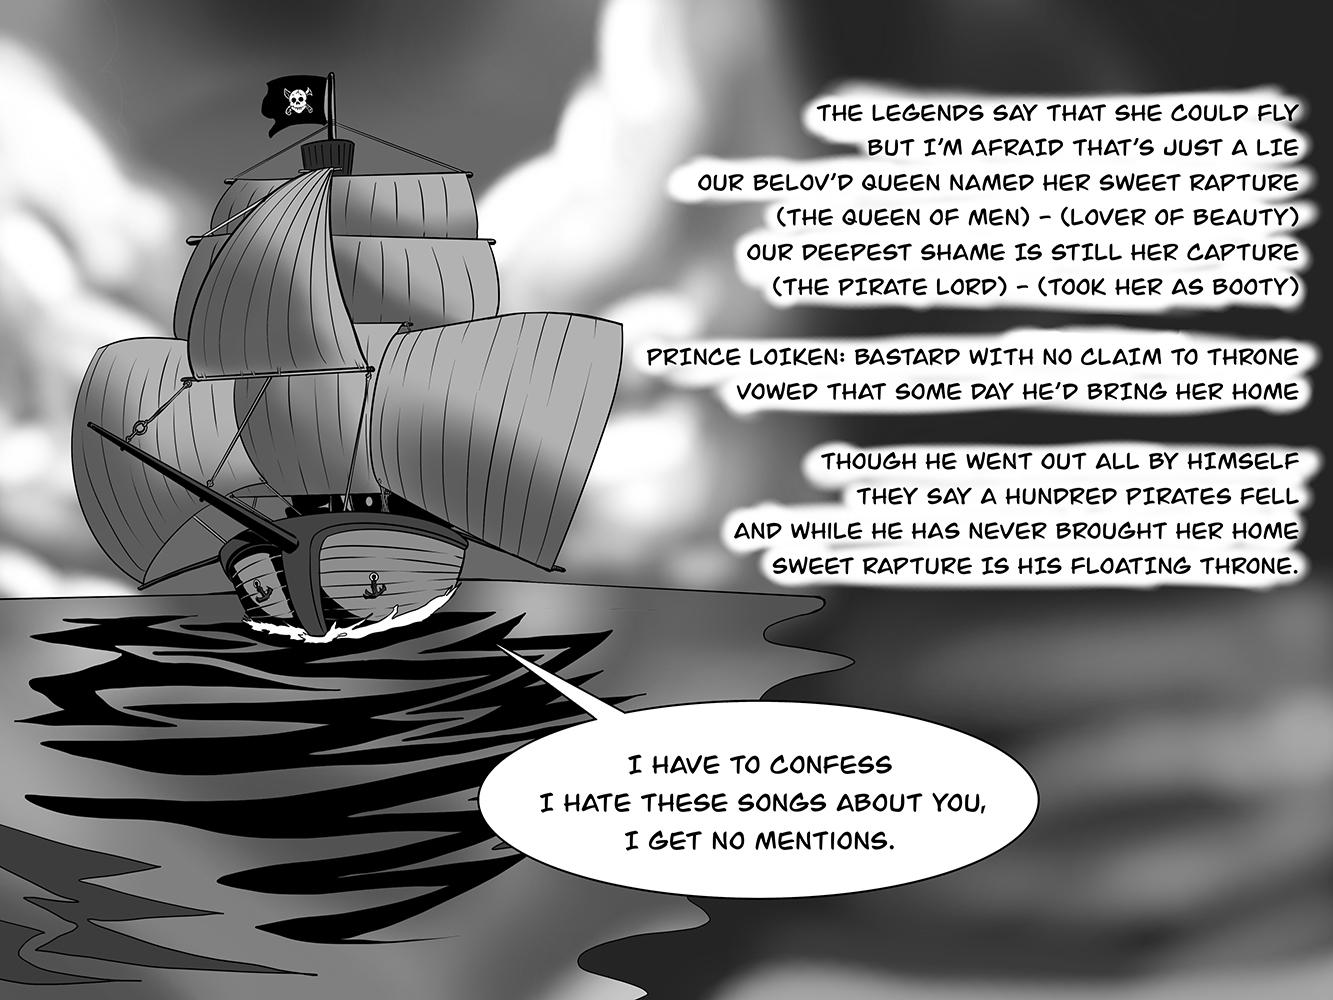 The Flying Pirateship